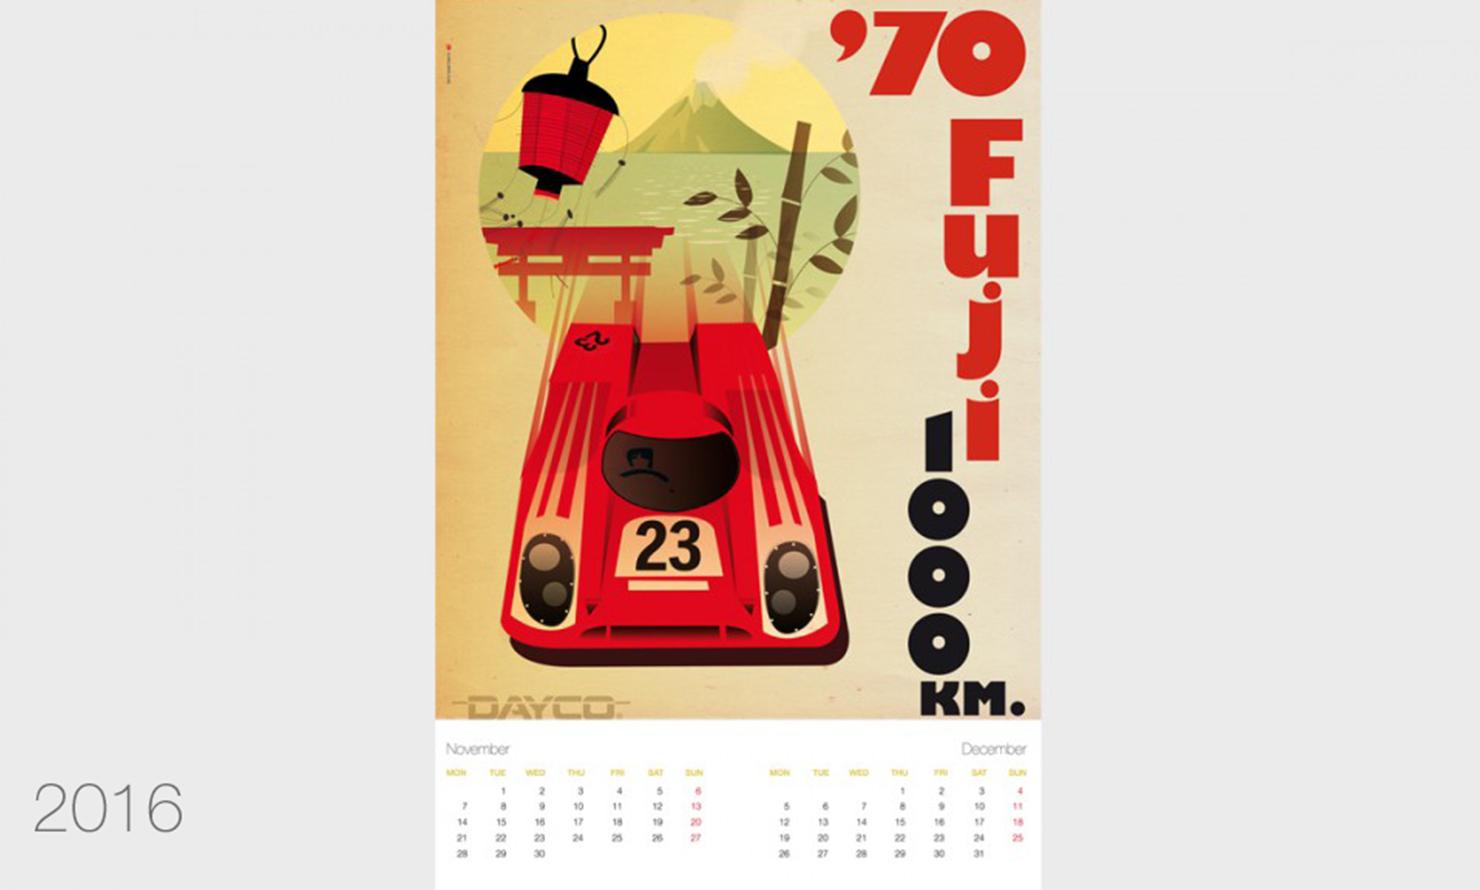 https://kubelibre.com/uploads/Slider-work-tutti-clienti/dayco-calendario-2016-6.jpg